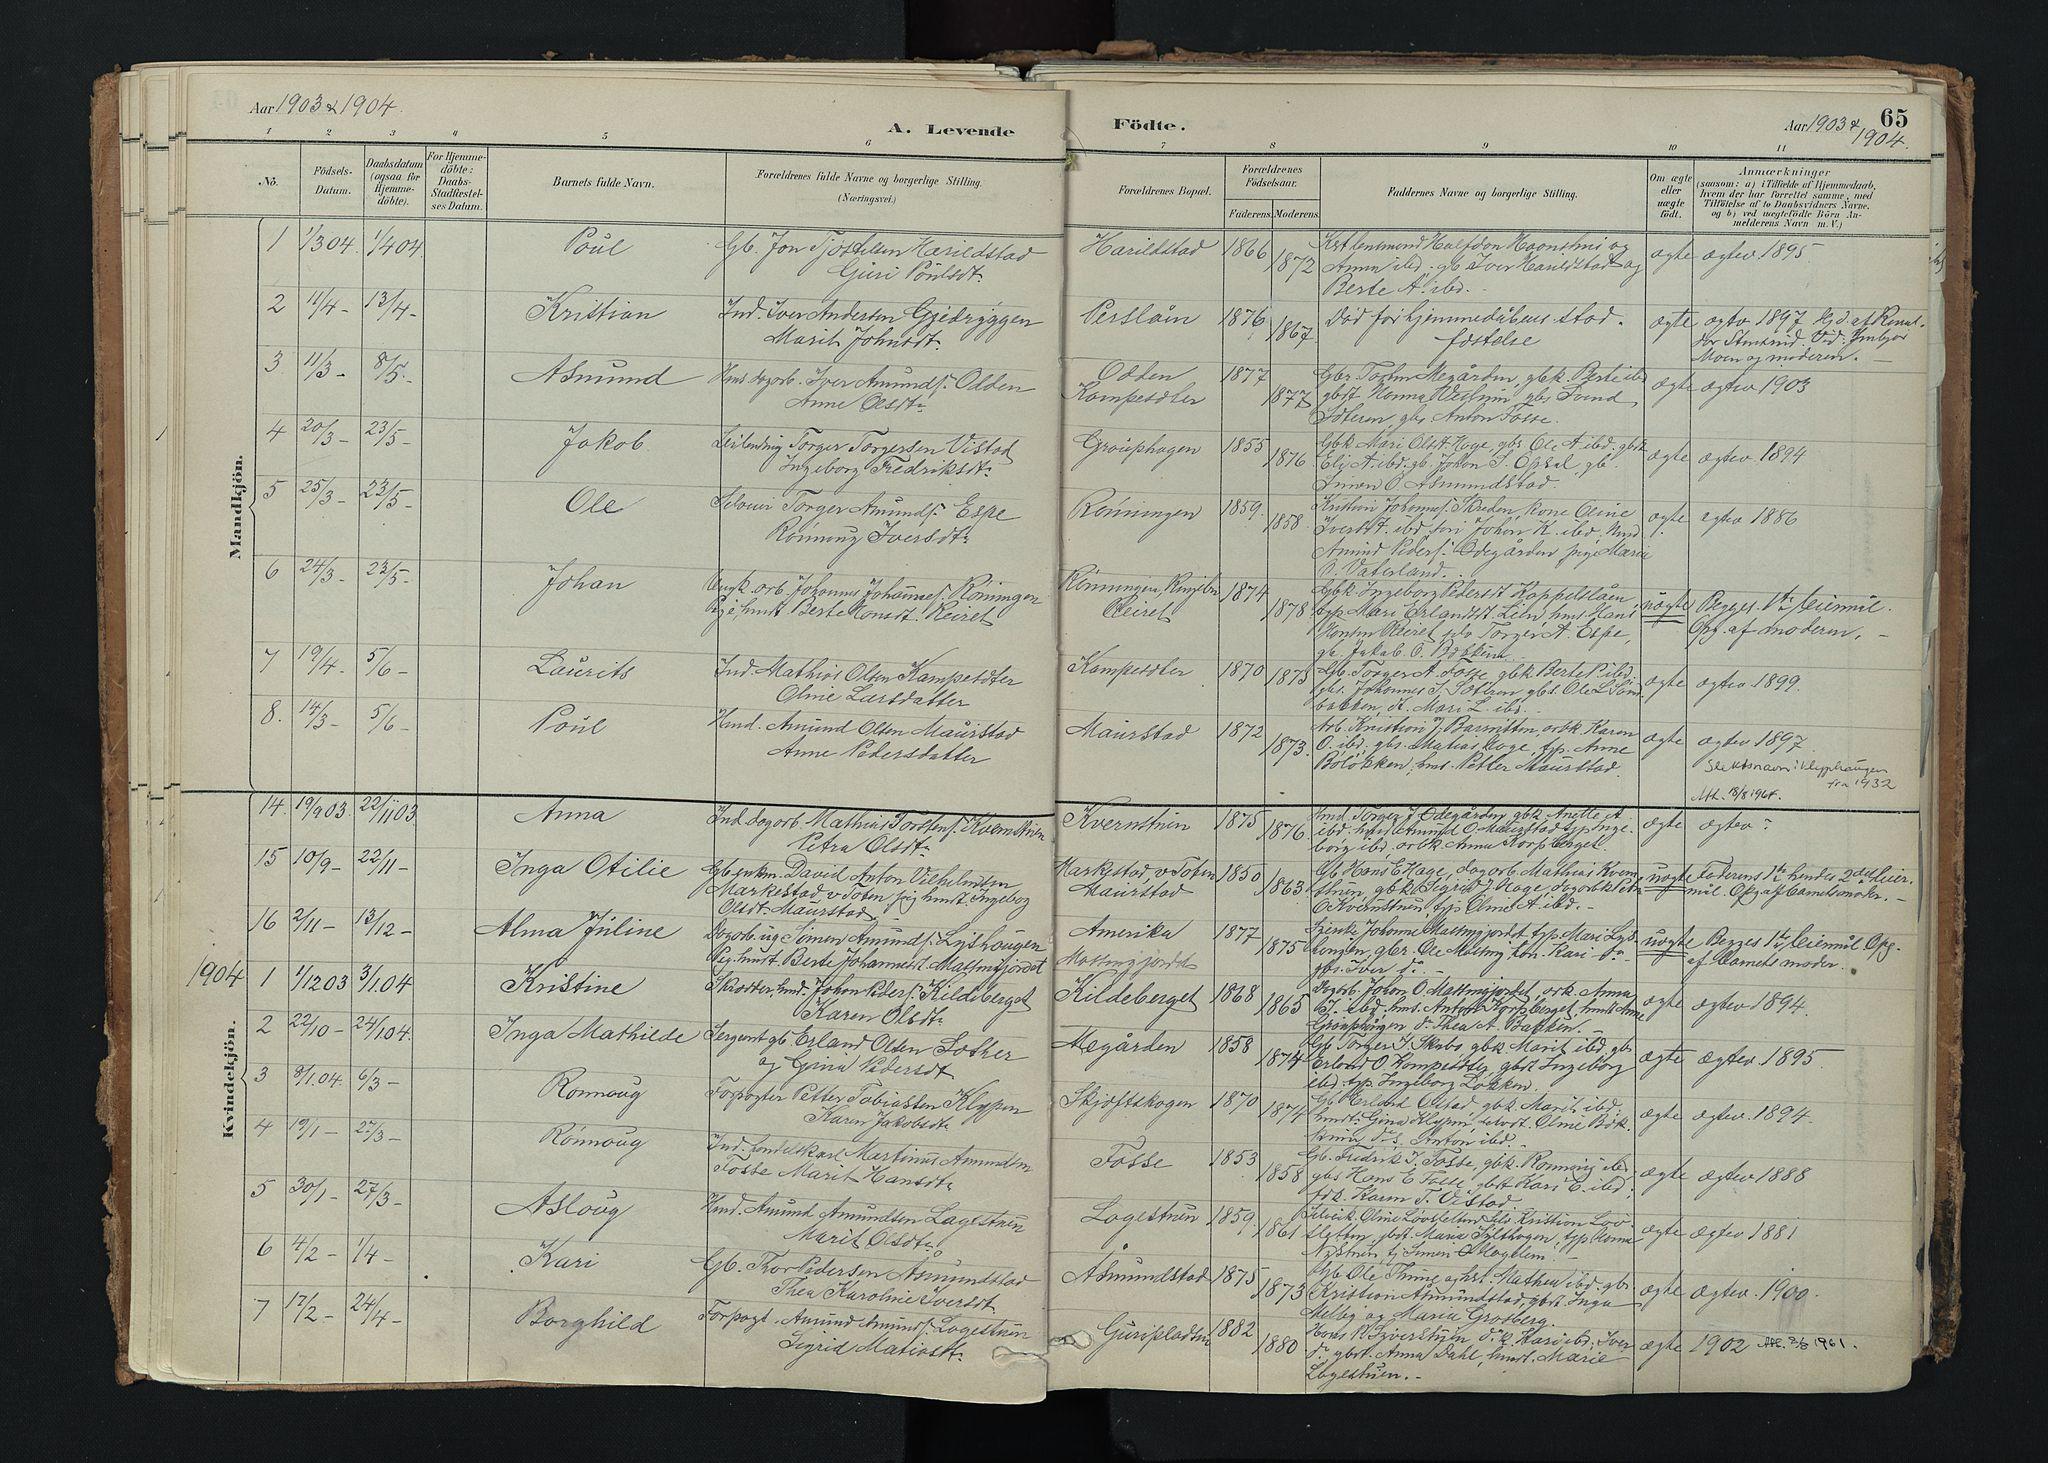 SAH, Nord-Fron prestekontor, Ministerialbok nr. 5, 1884-1914, s. 65